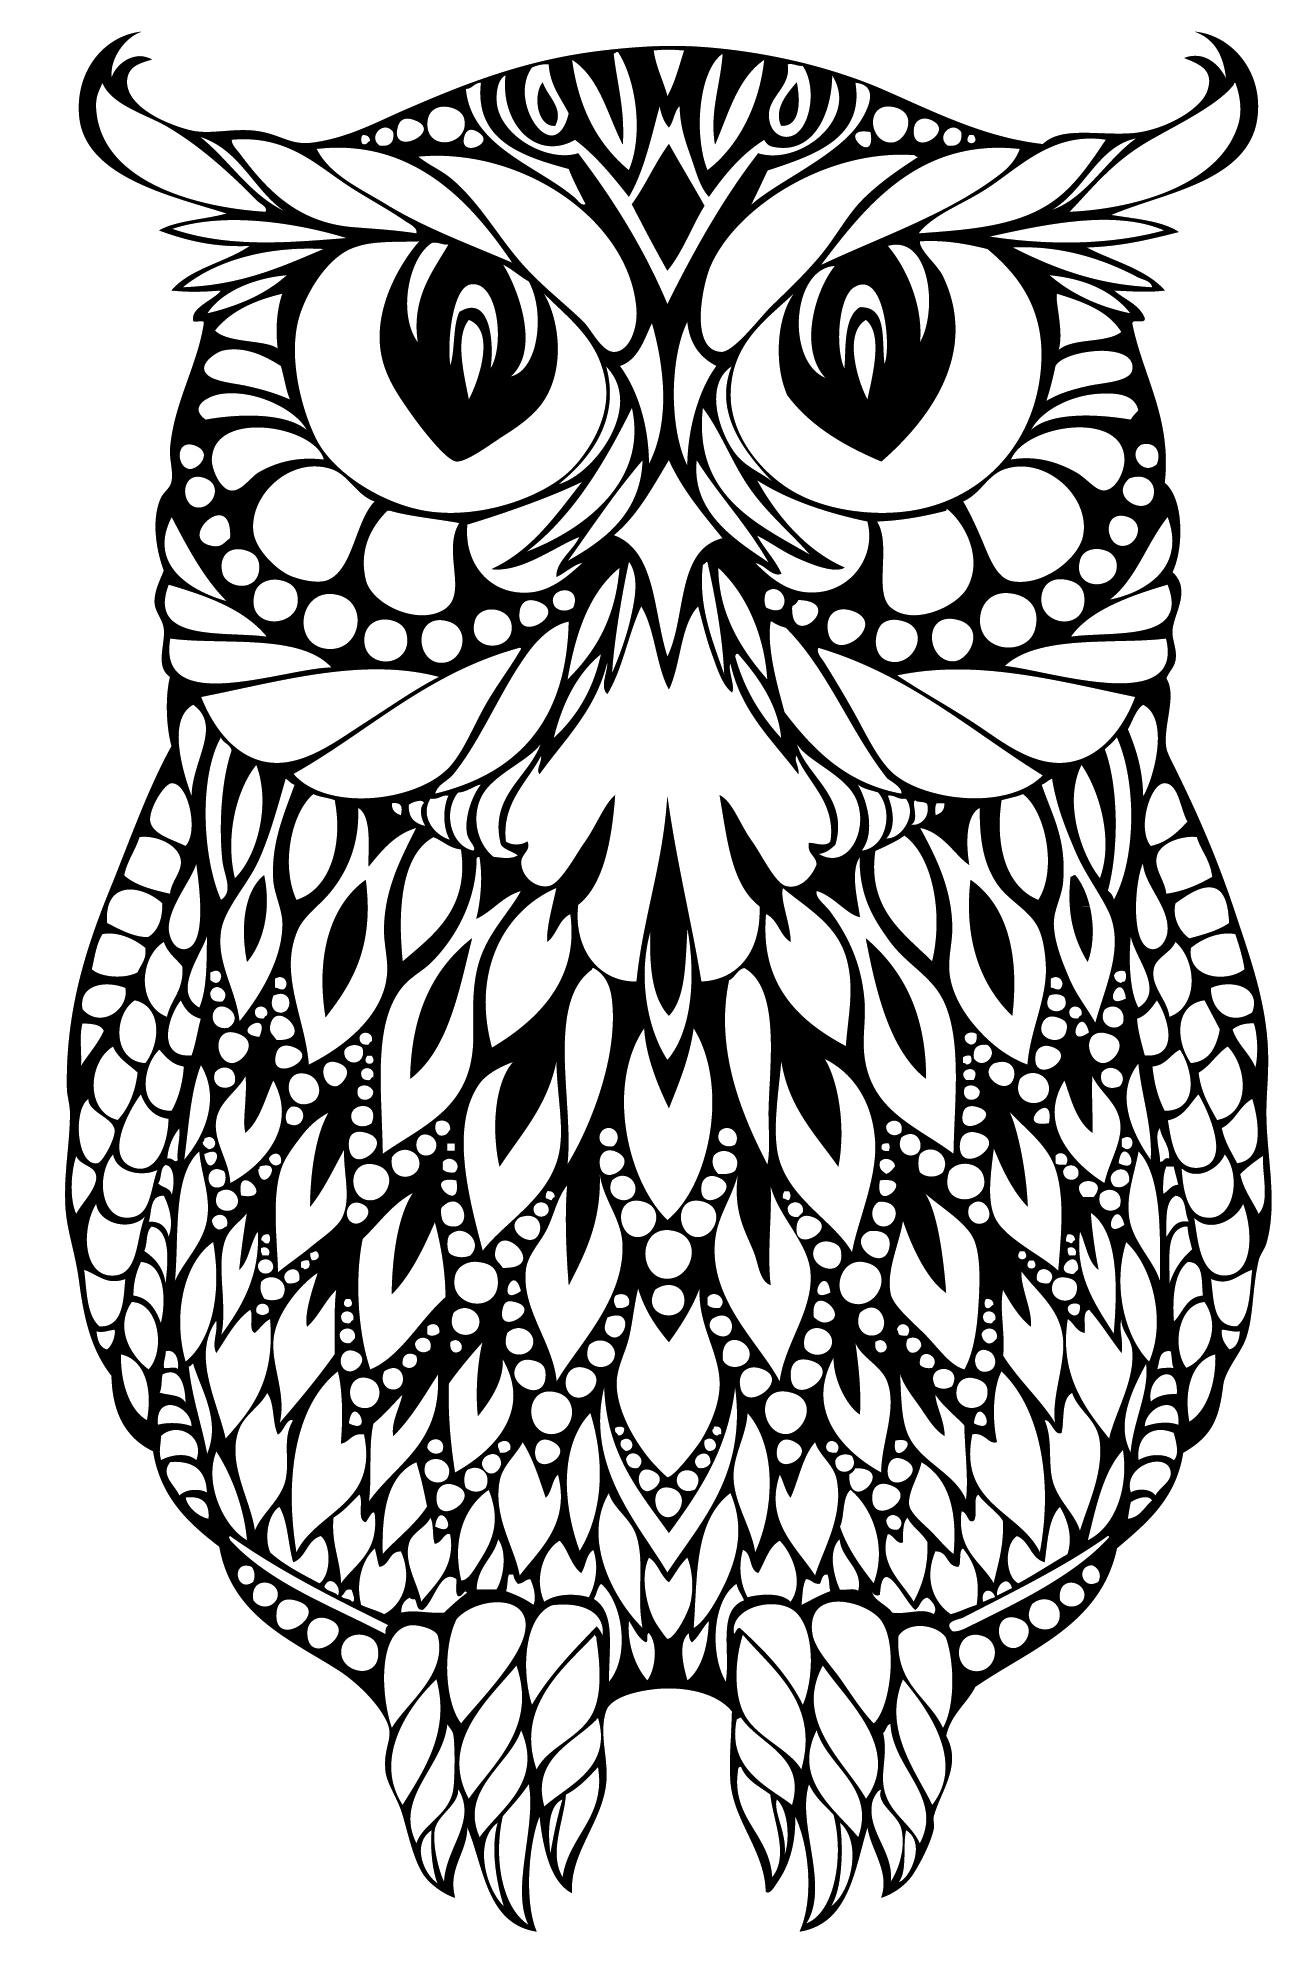 charming-owl-mandala-coloring-page